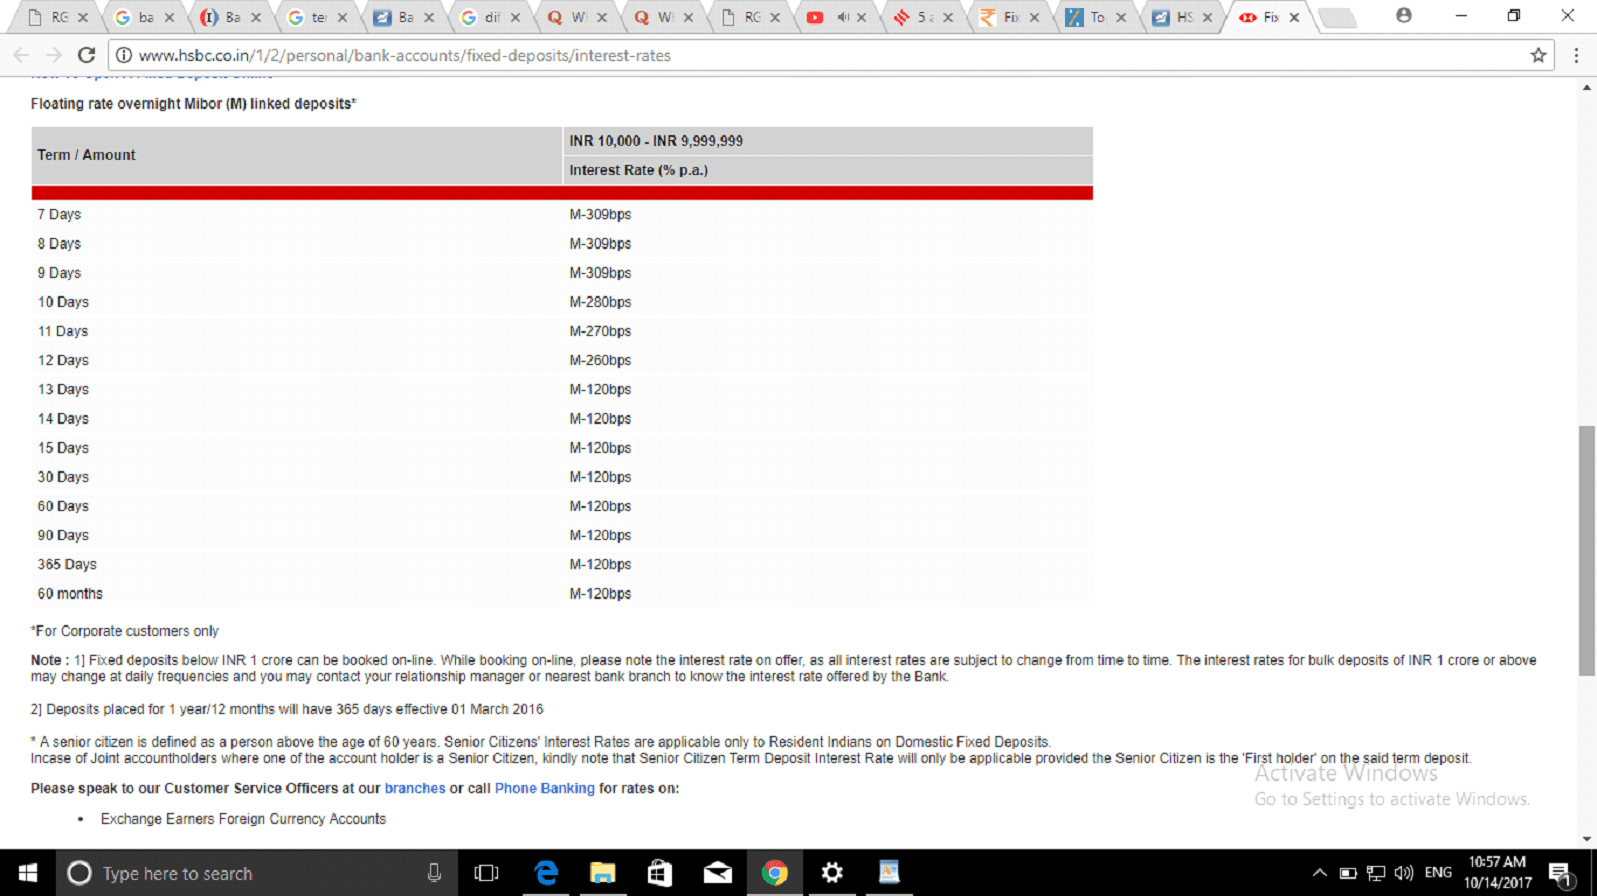 HSBC Deposit interest rates